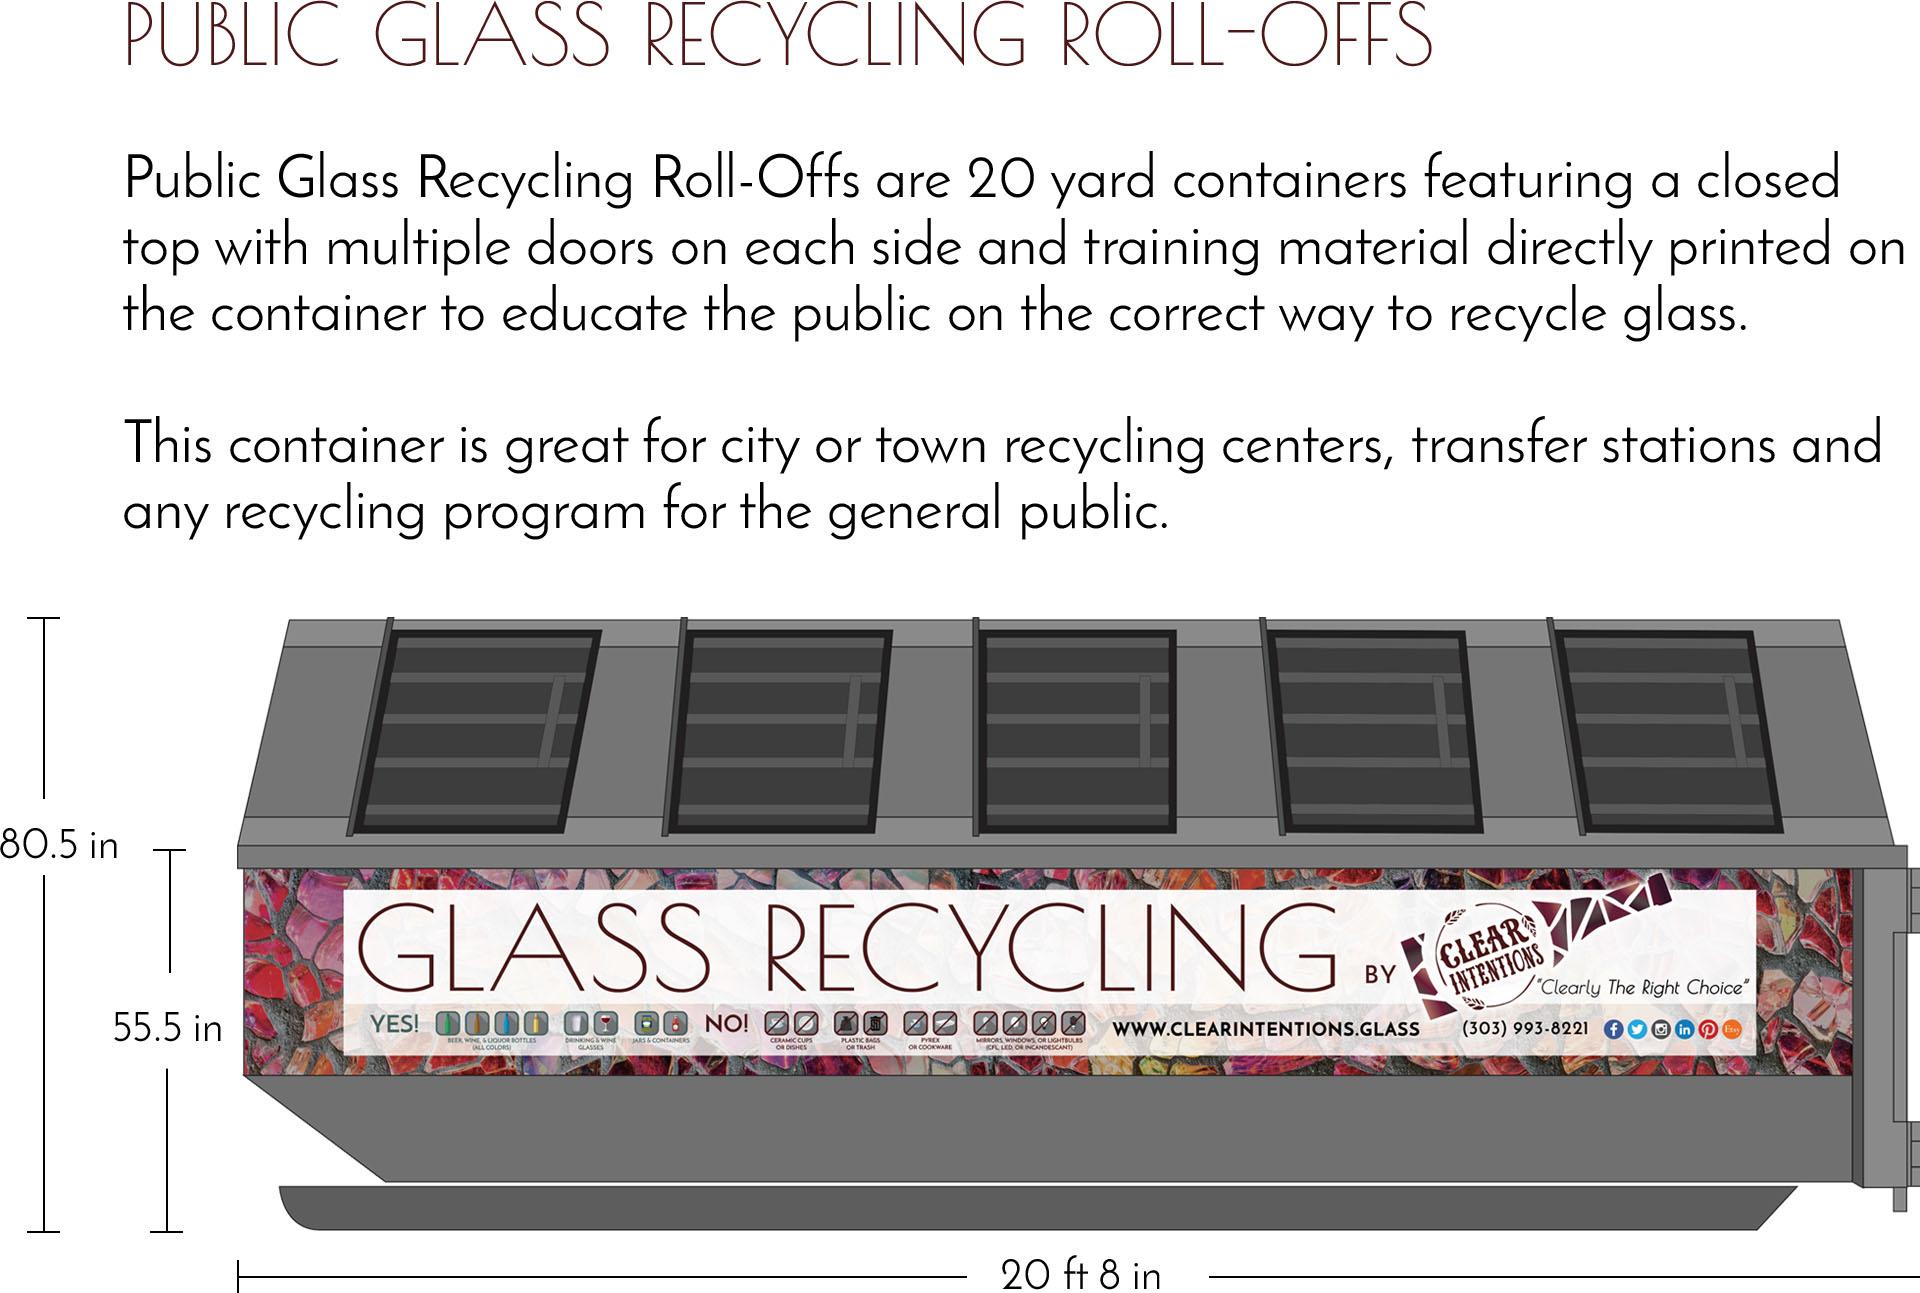 Public Glass Recycling Roll-Offs.jpg